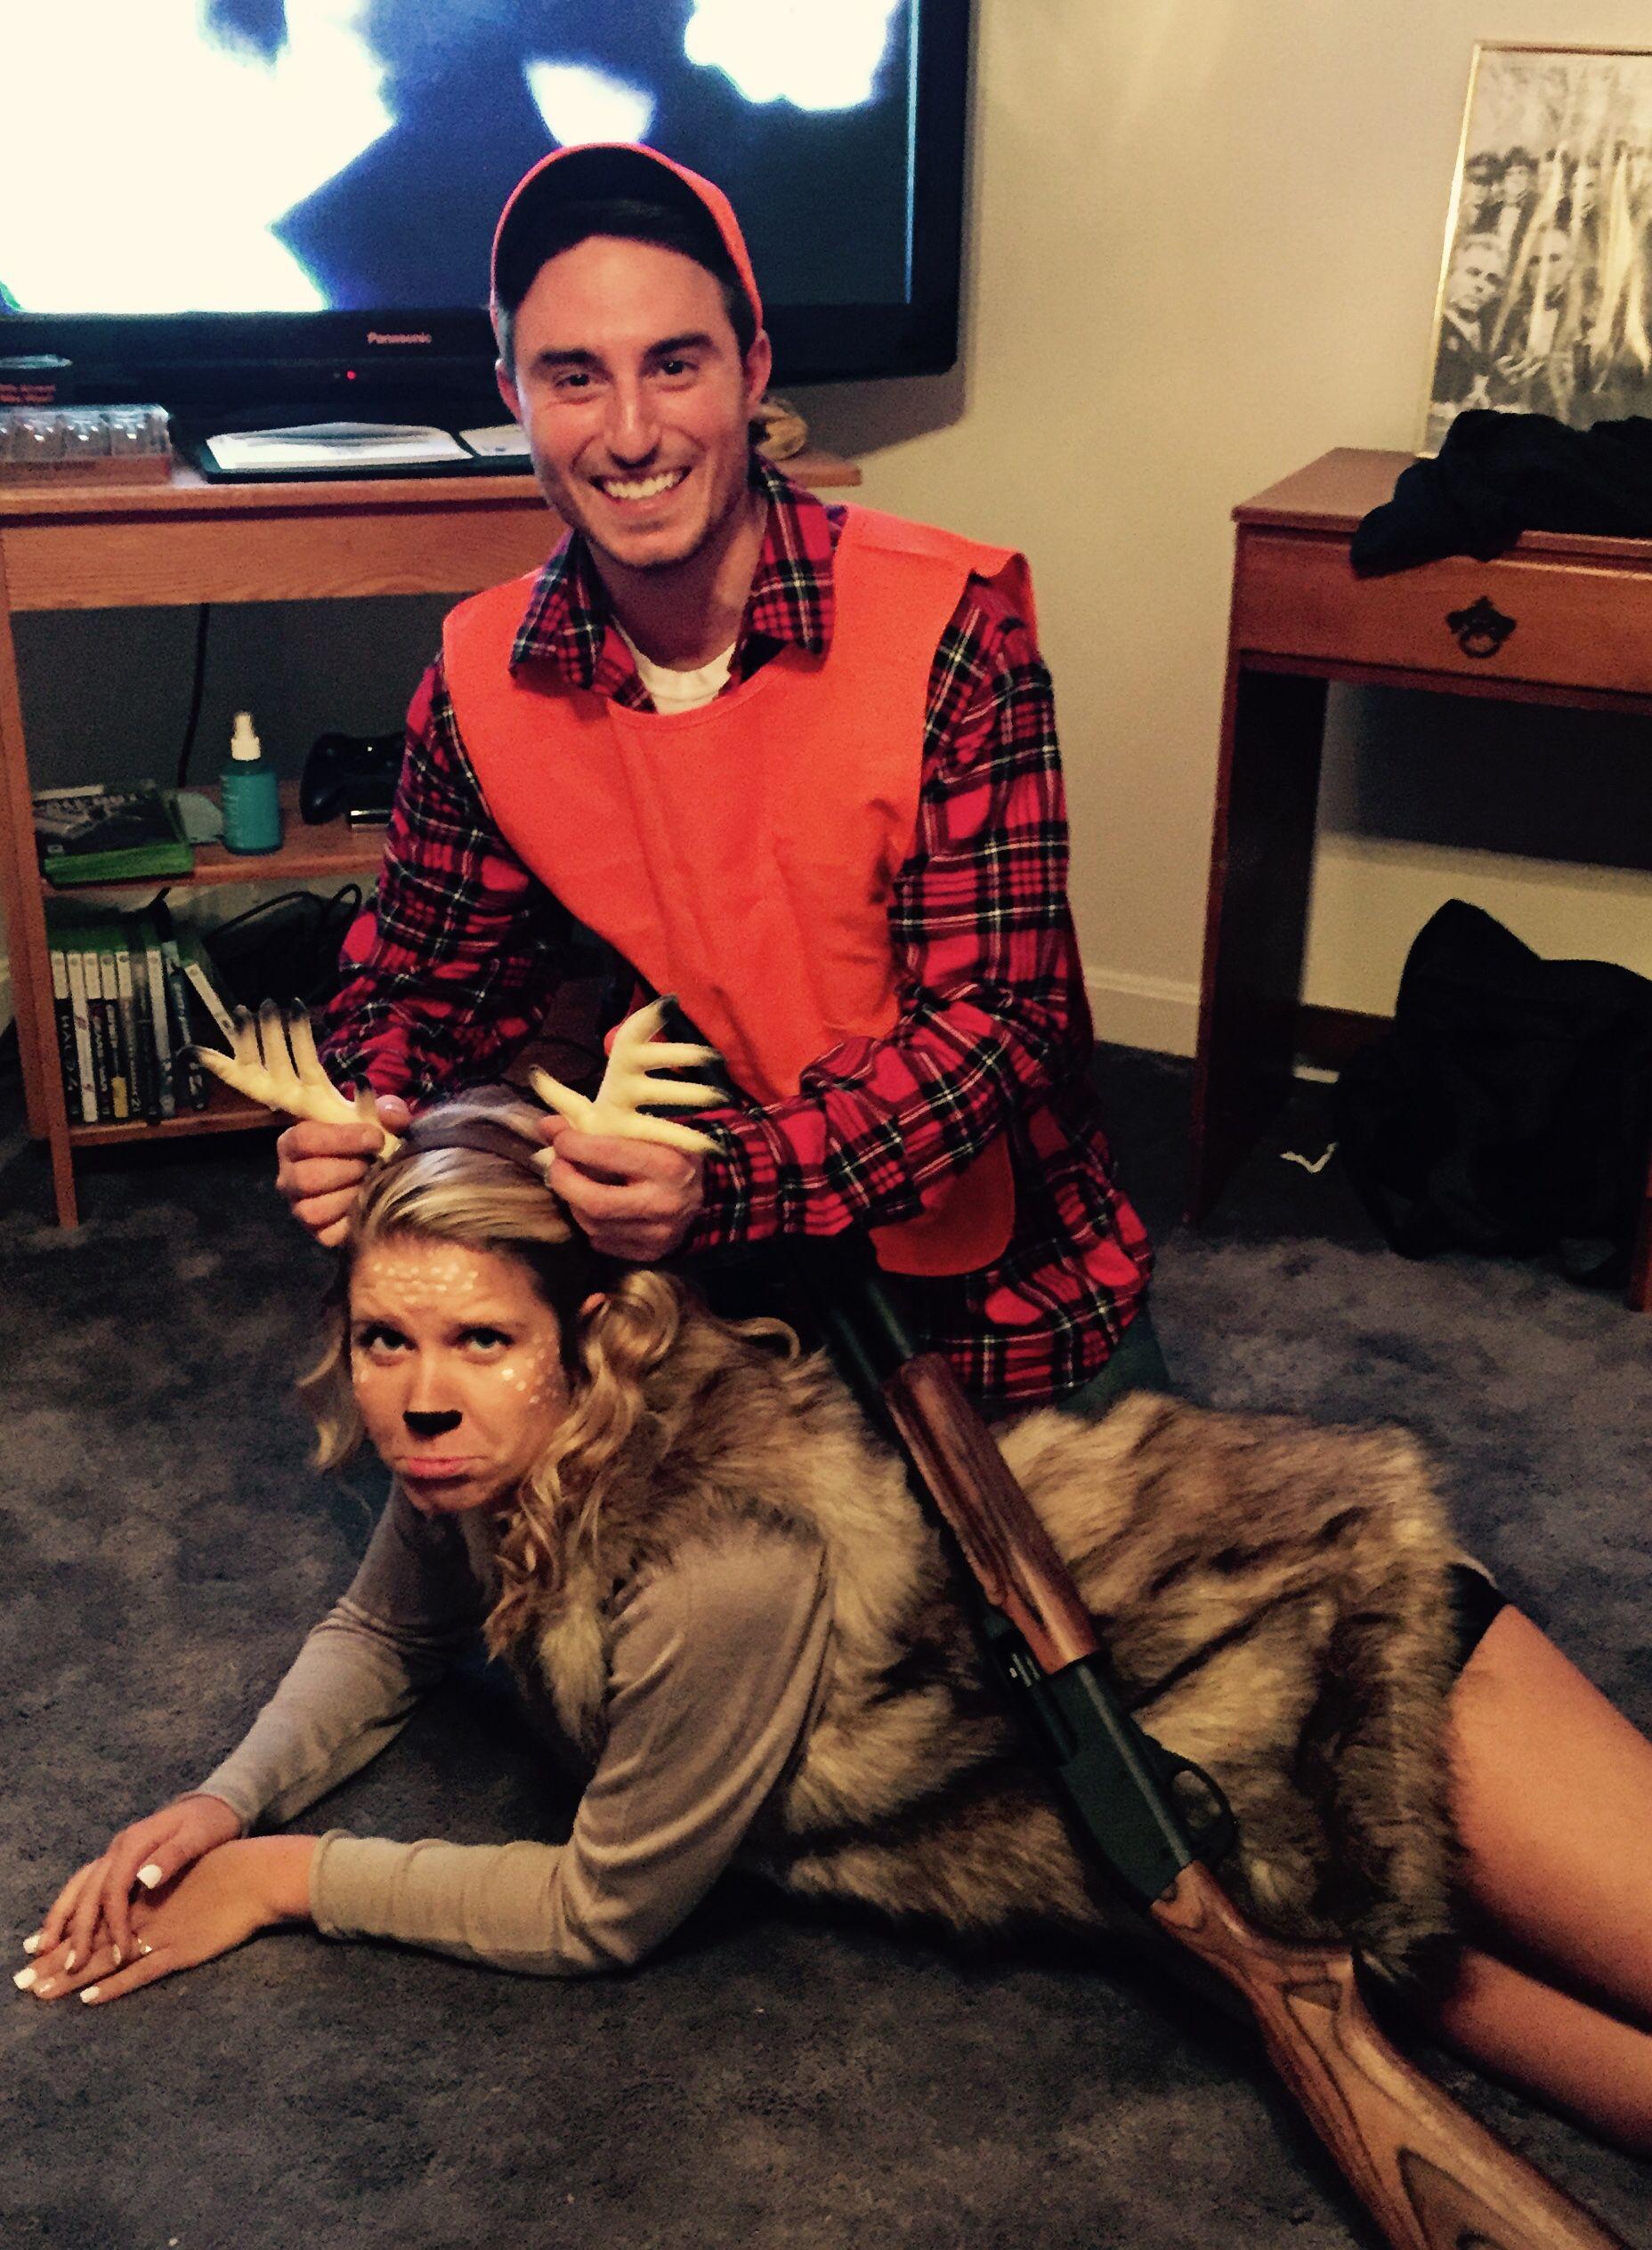 Deer and hunter Halloween costume #deer #hunter  sc 1 st  Pinterest & Deer and hunter Halloween costume #deer #hunter | Holidays ...